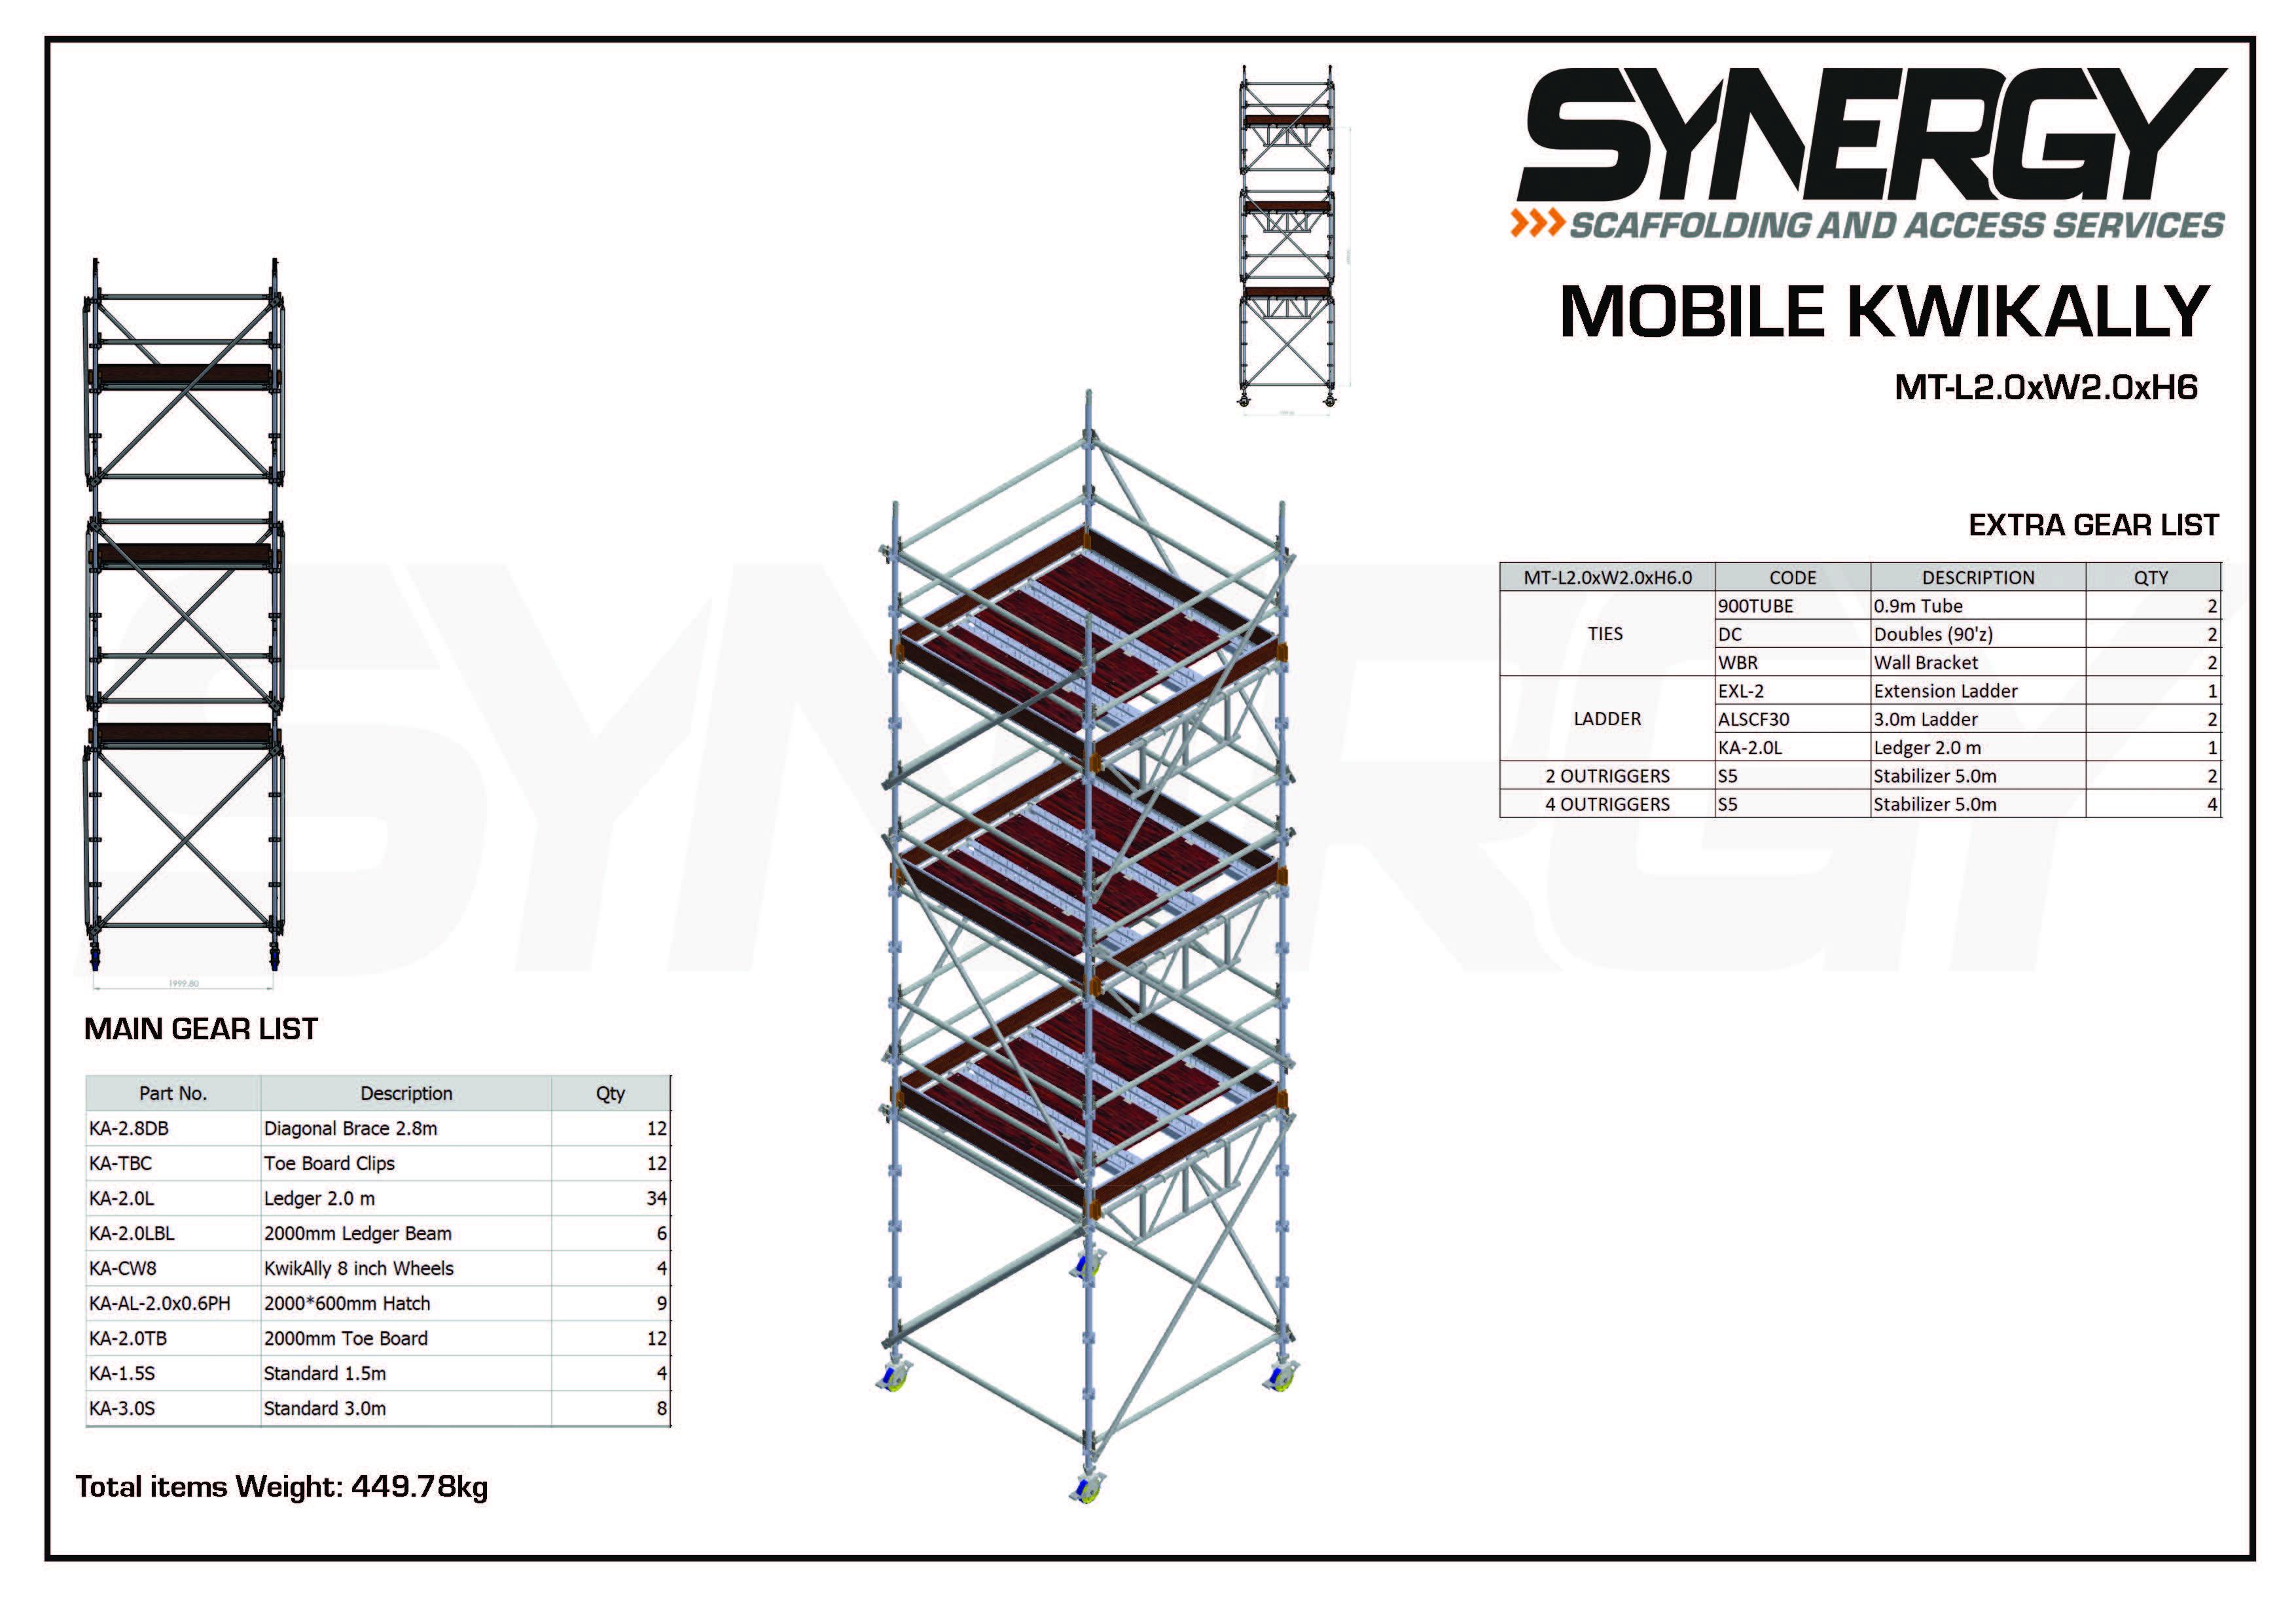 Kwikally Mobile 2.0m x 2.0m x 6m(Height)